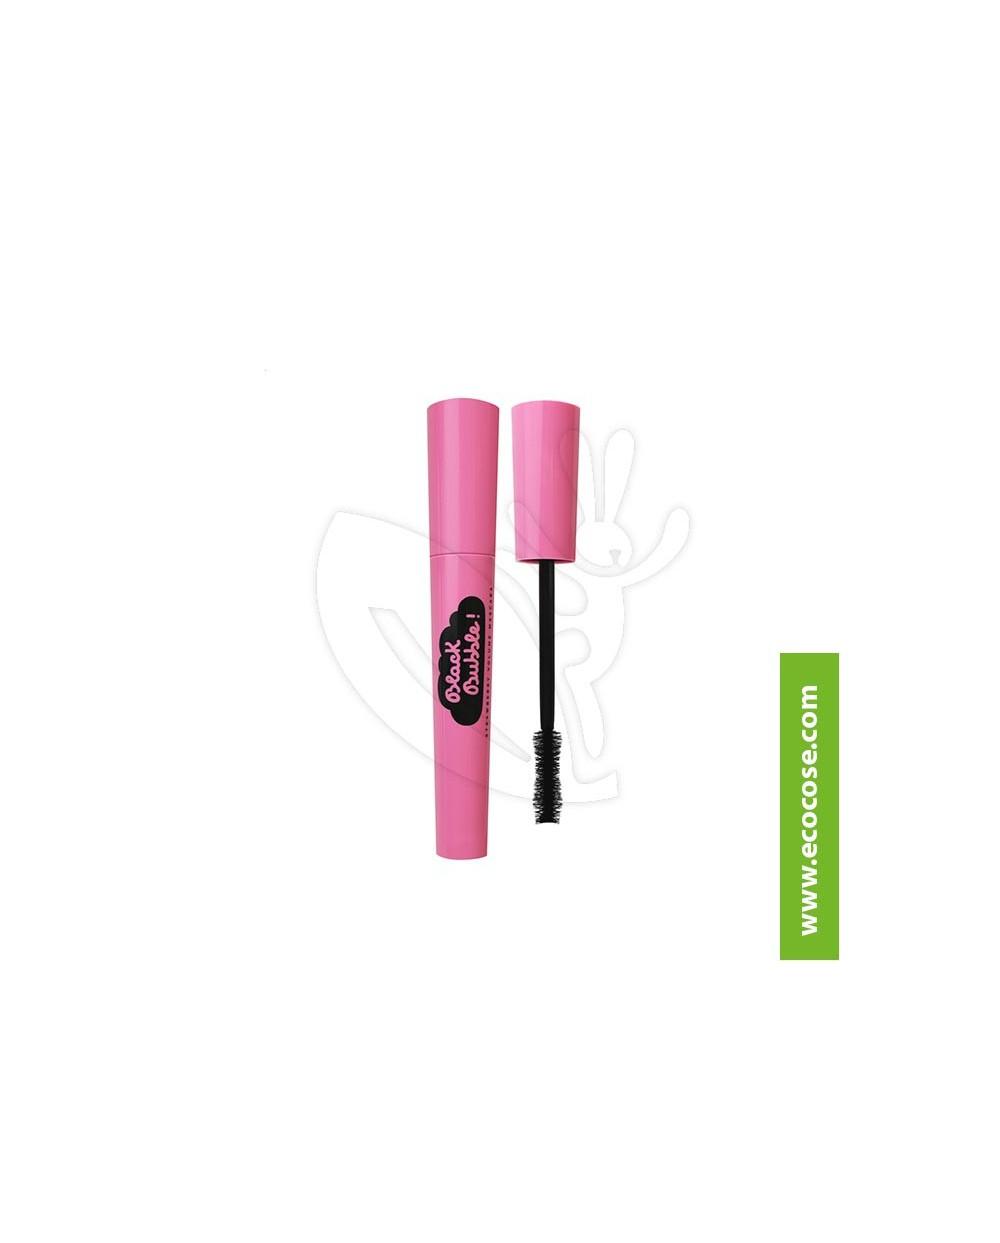 Neve Cosmetics - Black Bubble natural mascara